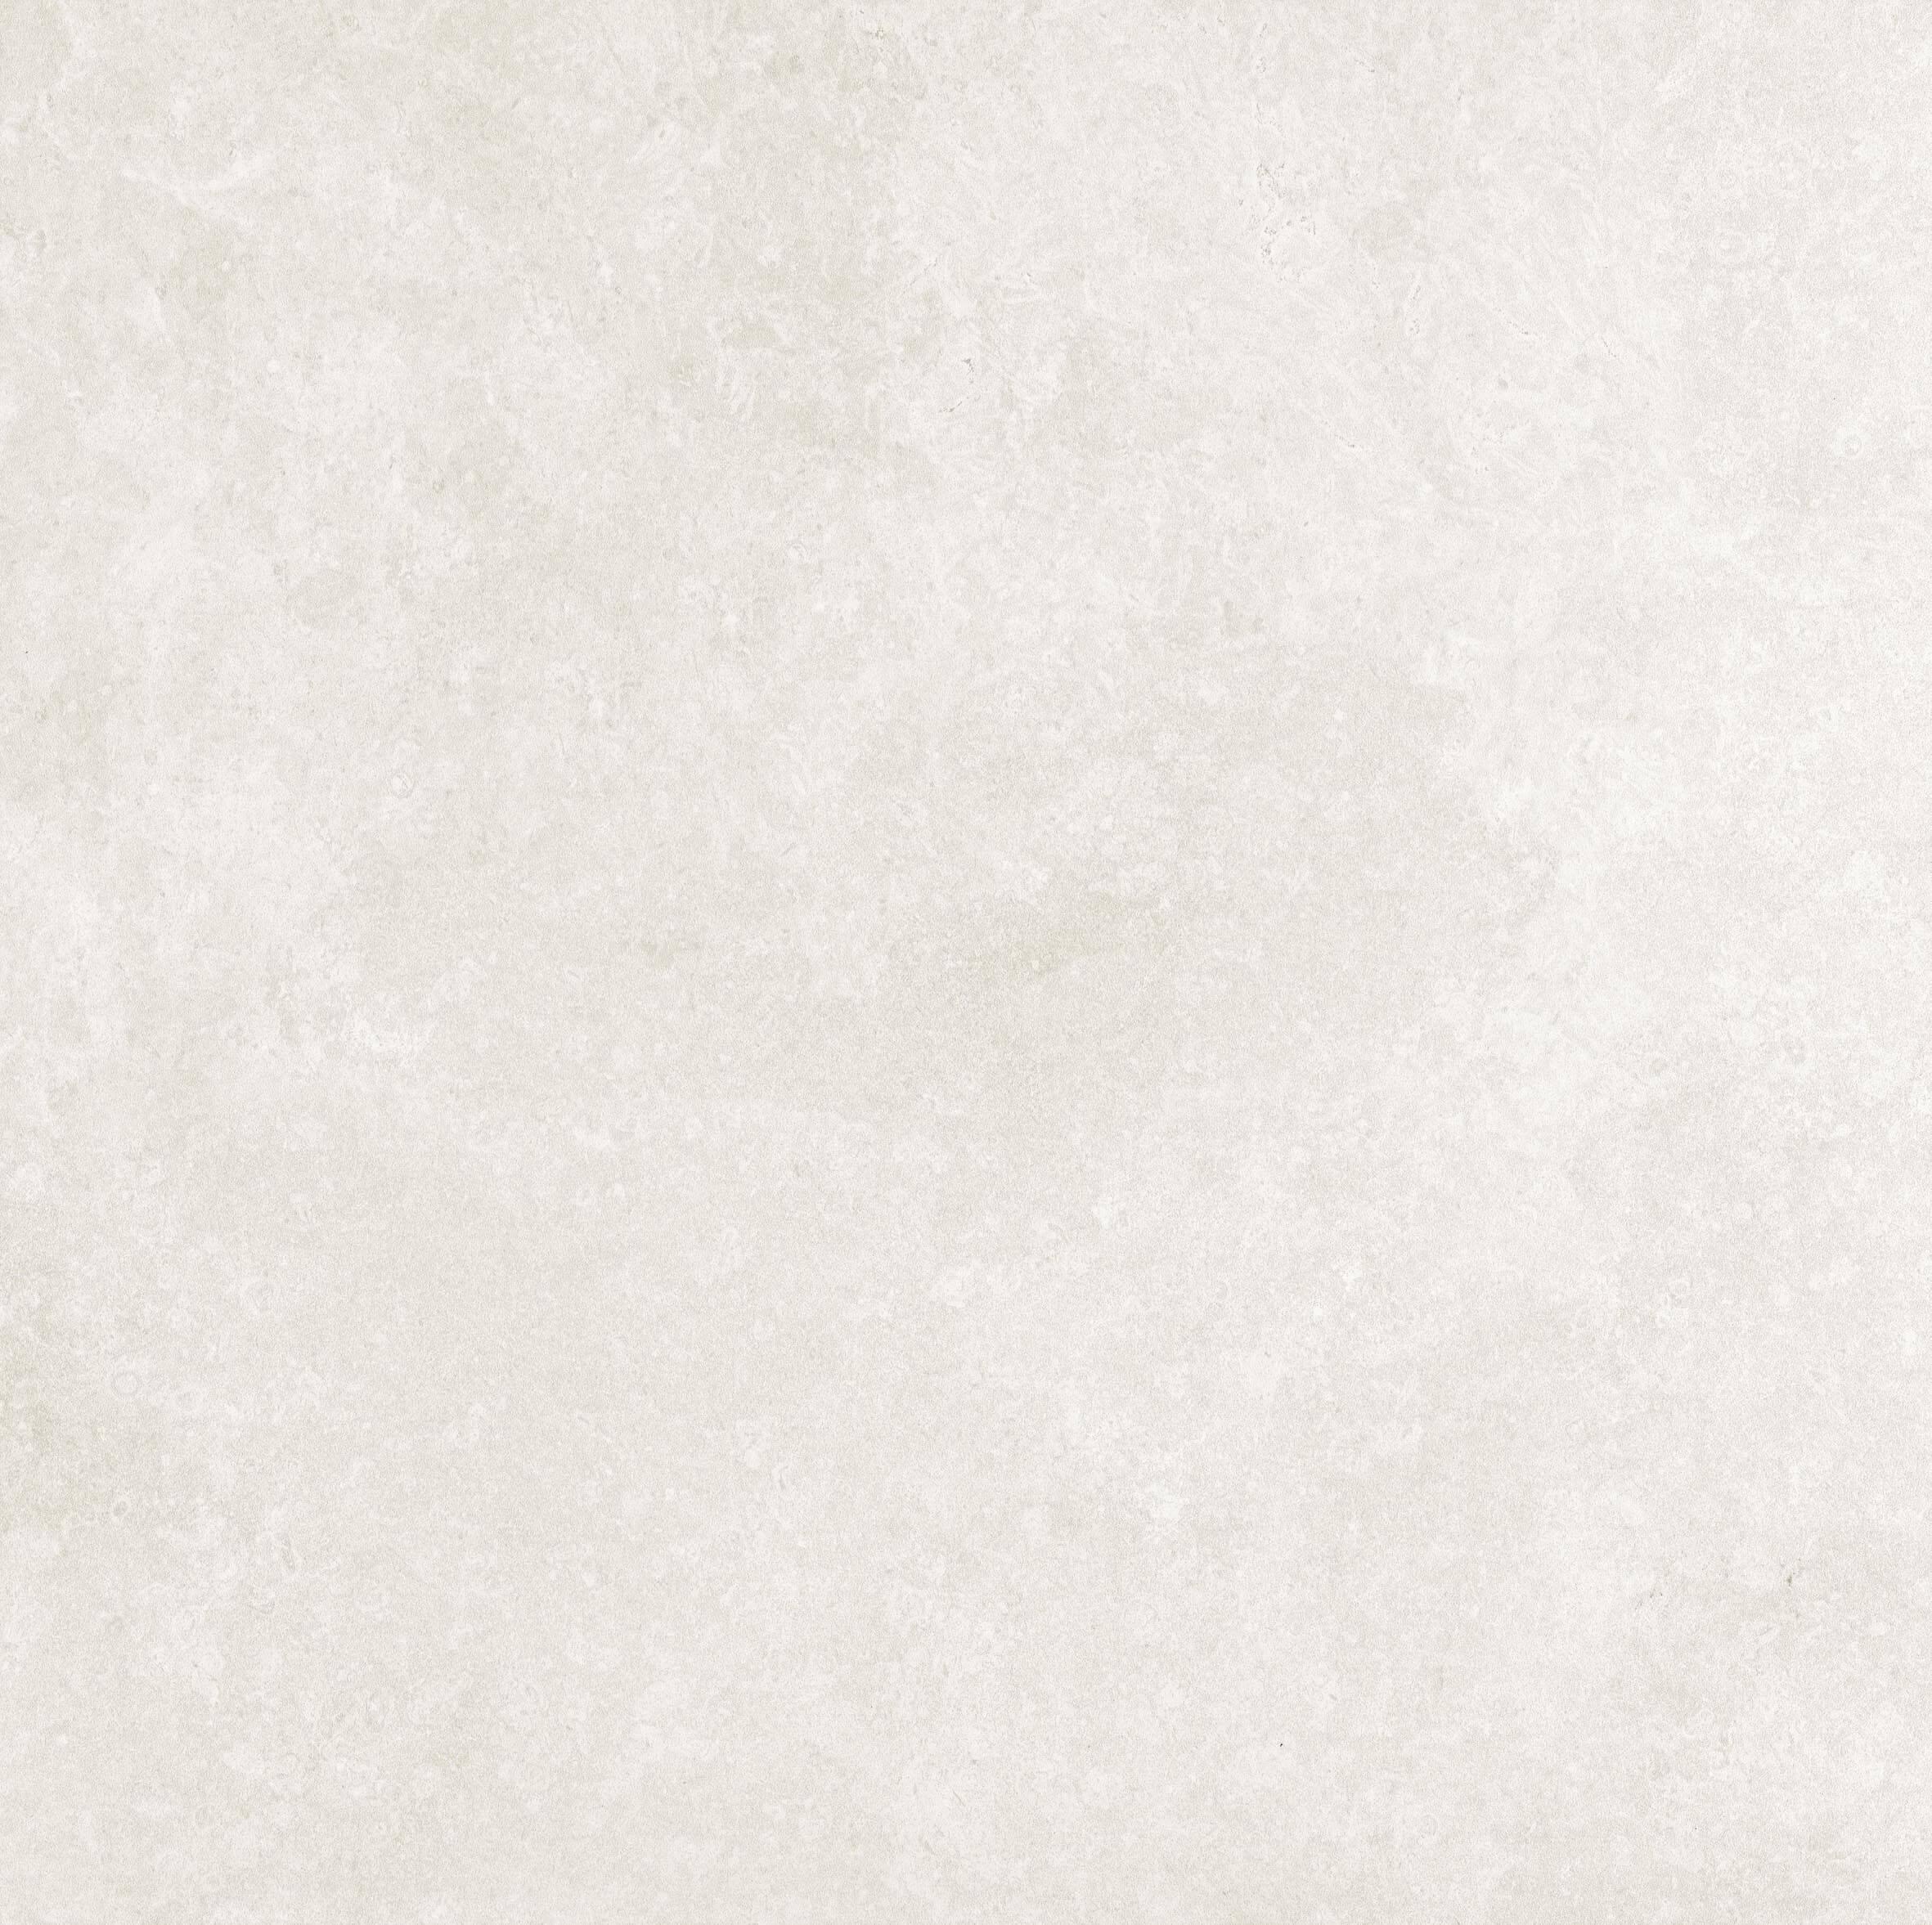 00601_More bianco 60x60 nat_ret_1